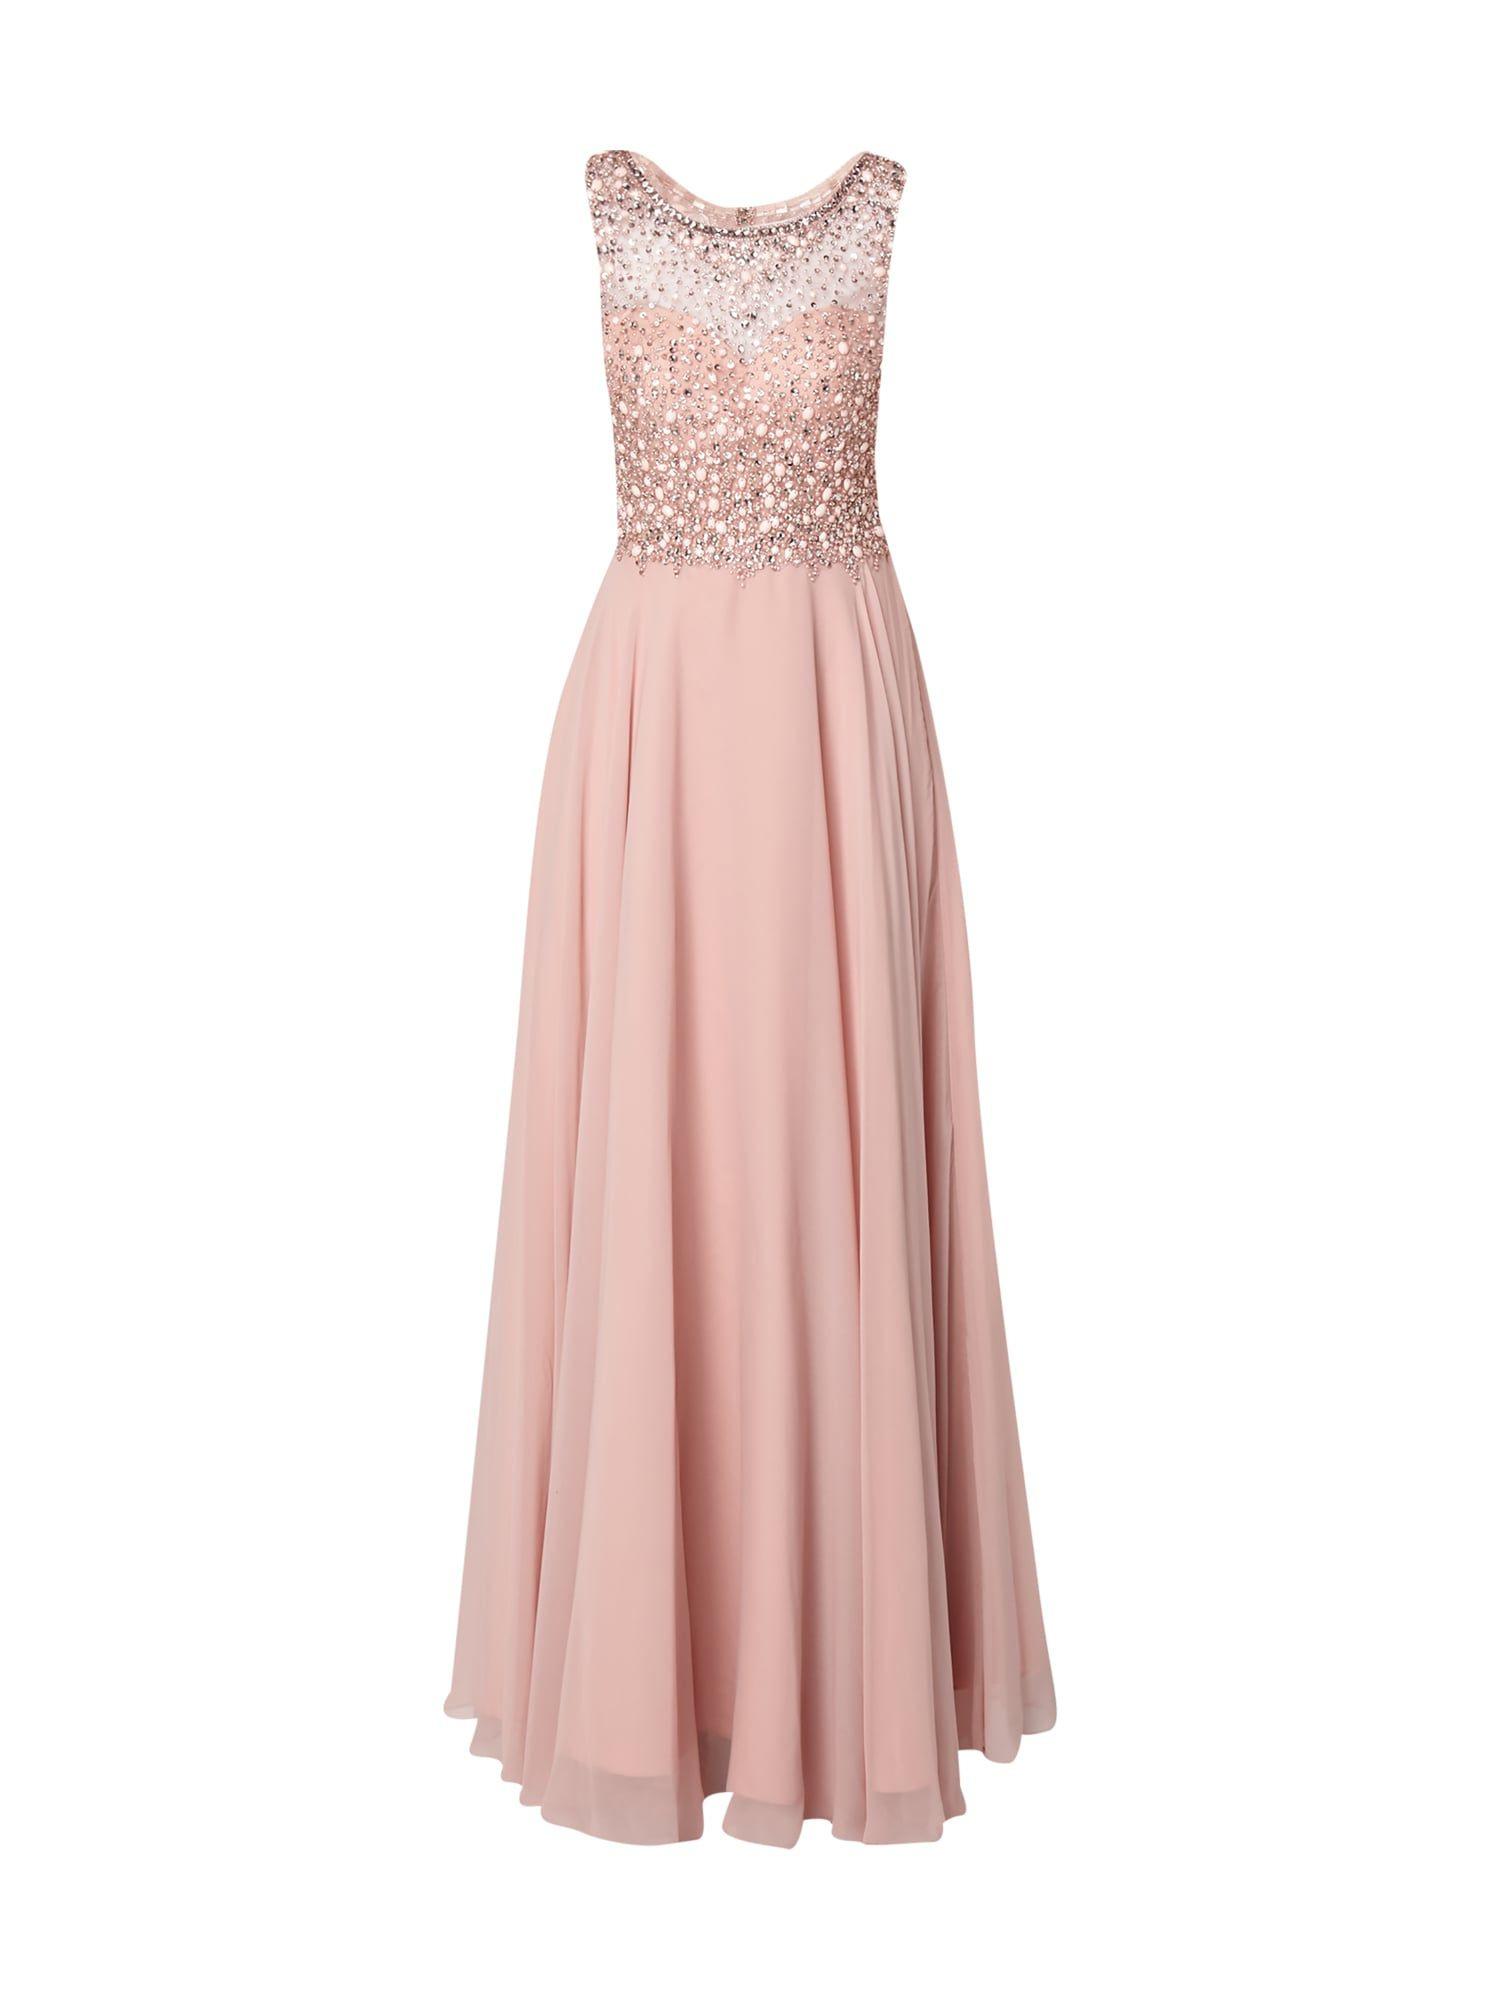 Formal Luxus Abendkleid Online Shop Galerie13 Elegant Abendkleid Online Shop Vertrieb